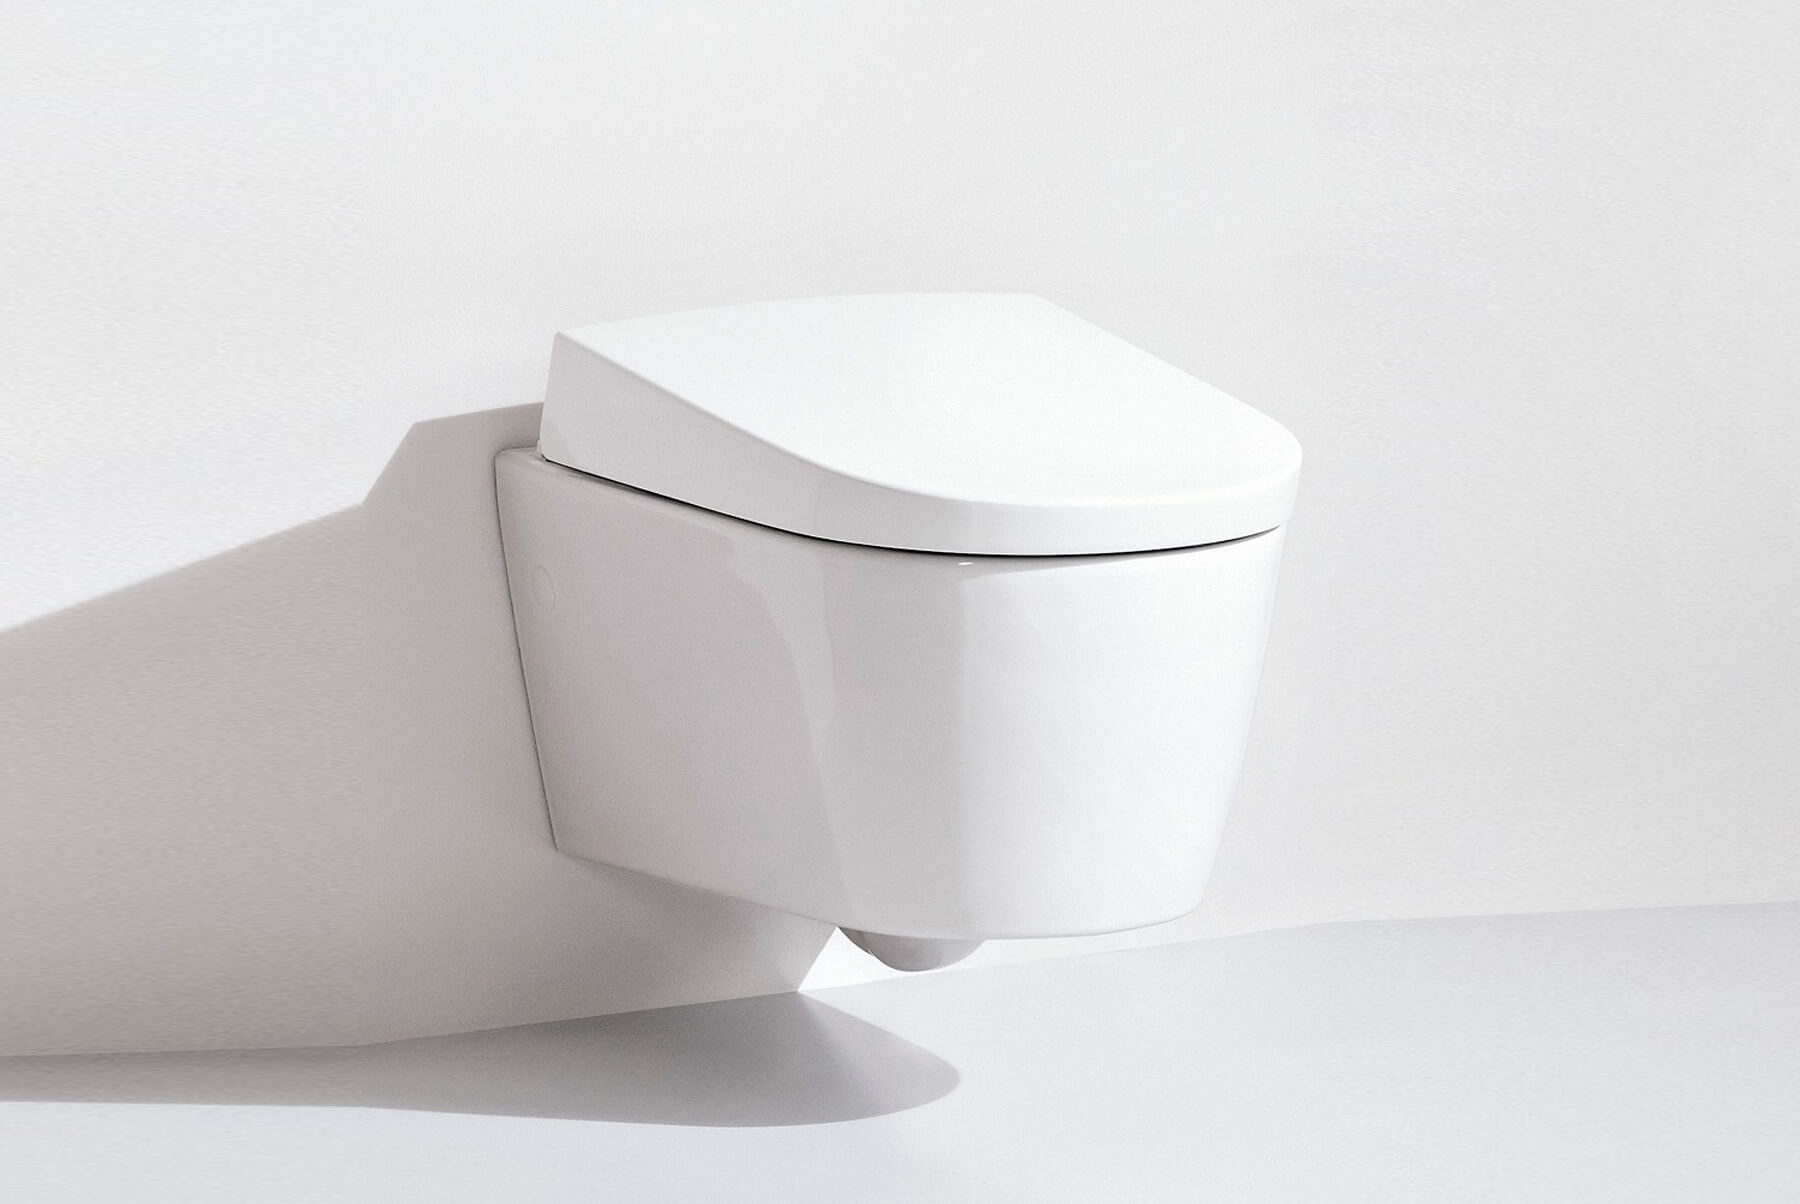 WC-&-WASHLETS-GEBERIT-AQUACLEAN-INSET-6-1800x1204